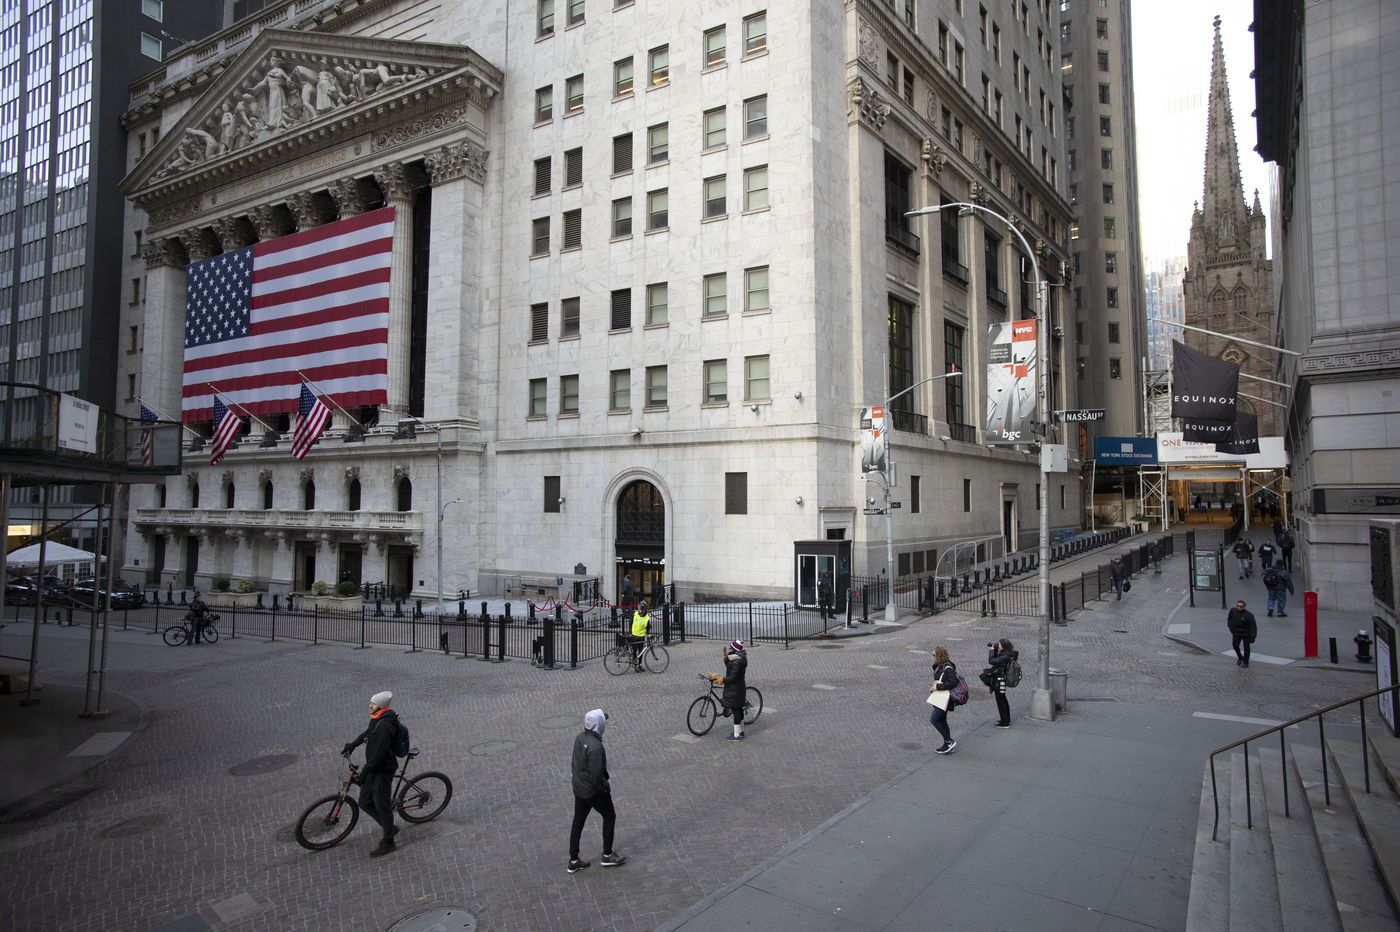 Stocks fall on Wall Street despite Federal Reserve aid, as coronavirus relief bill stalls again